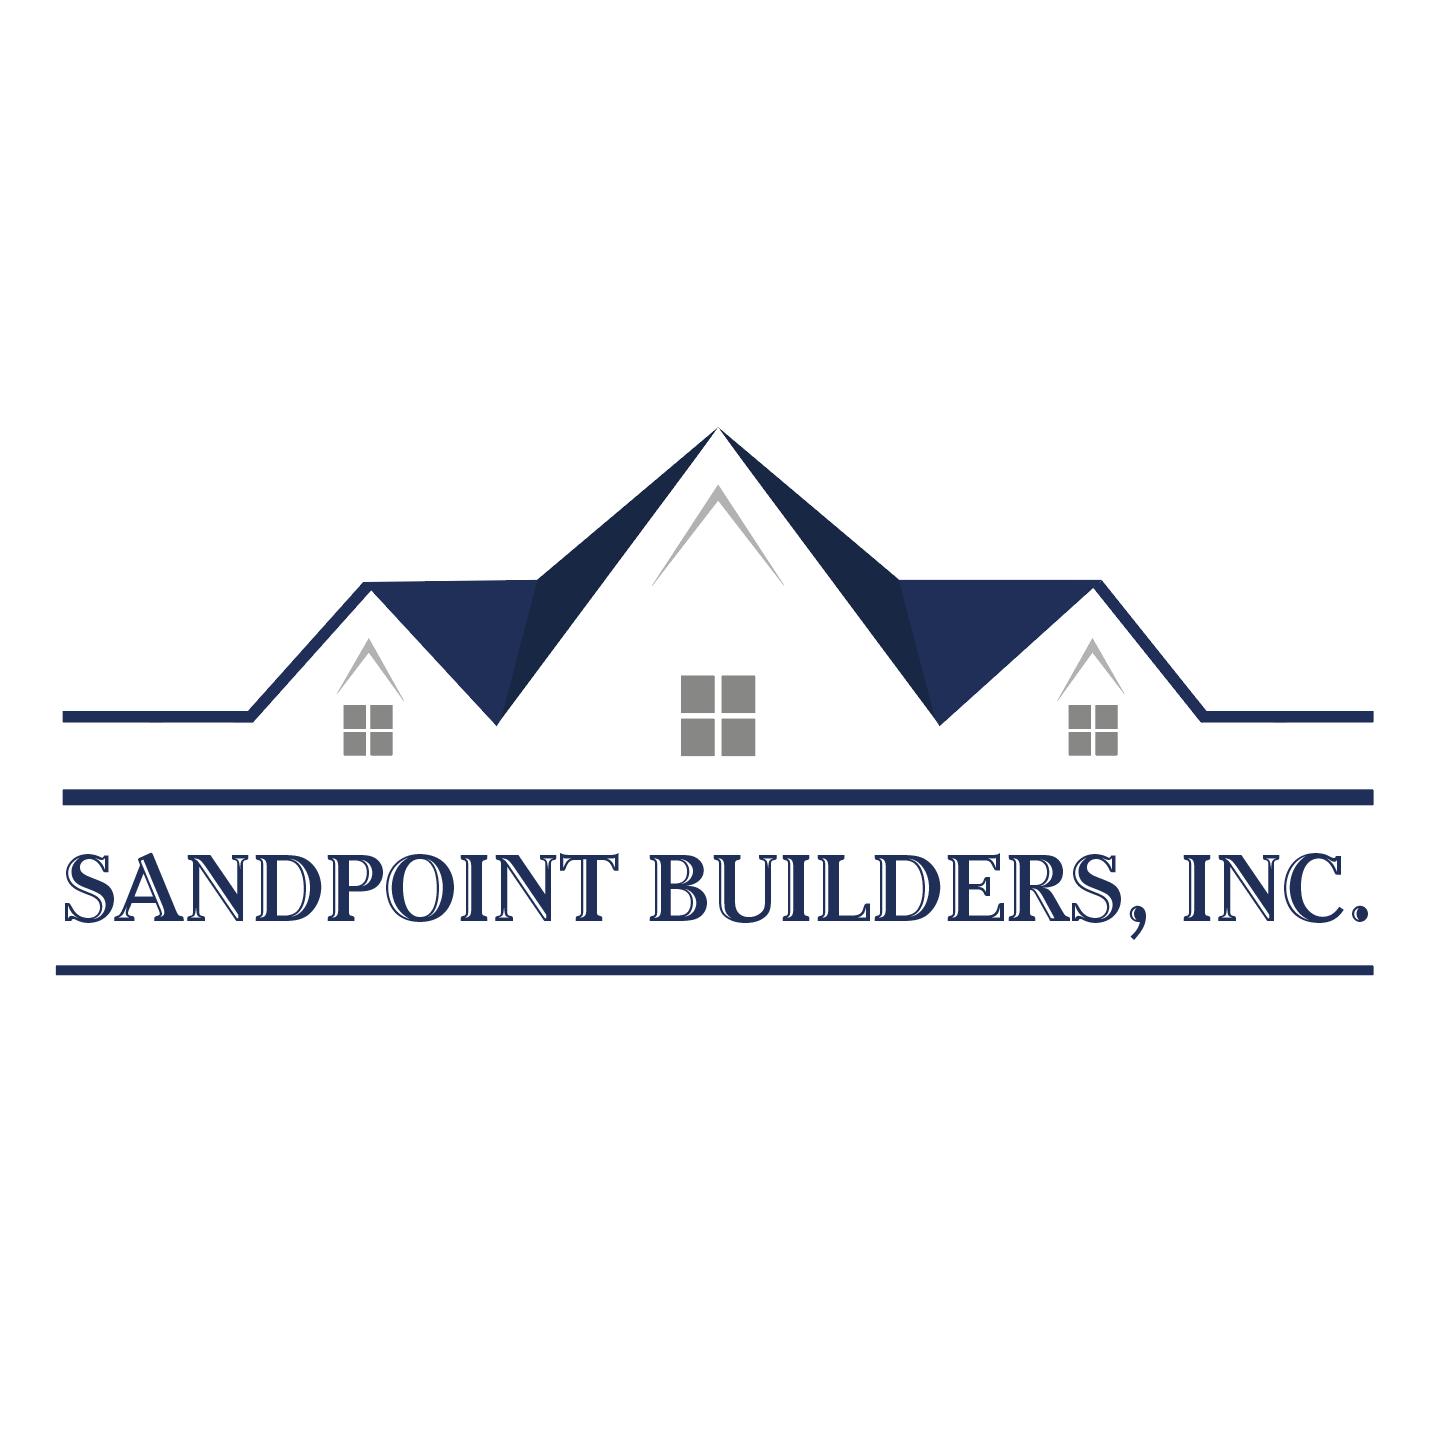 Sandpoint Builders Inc.